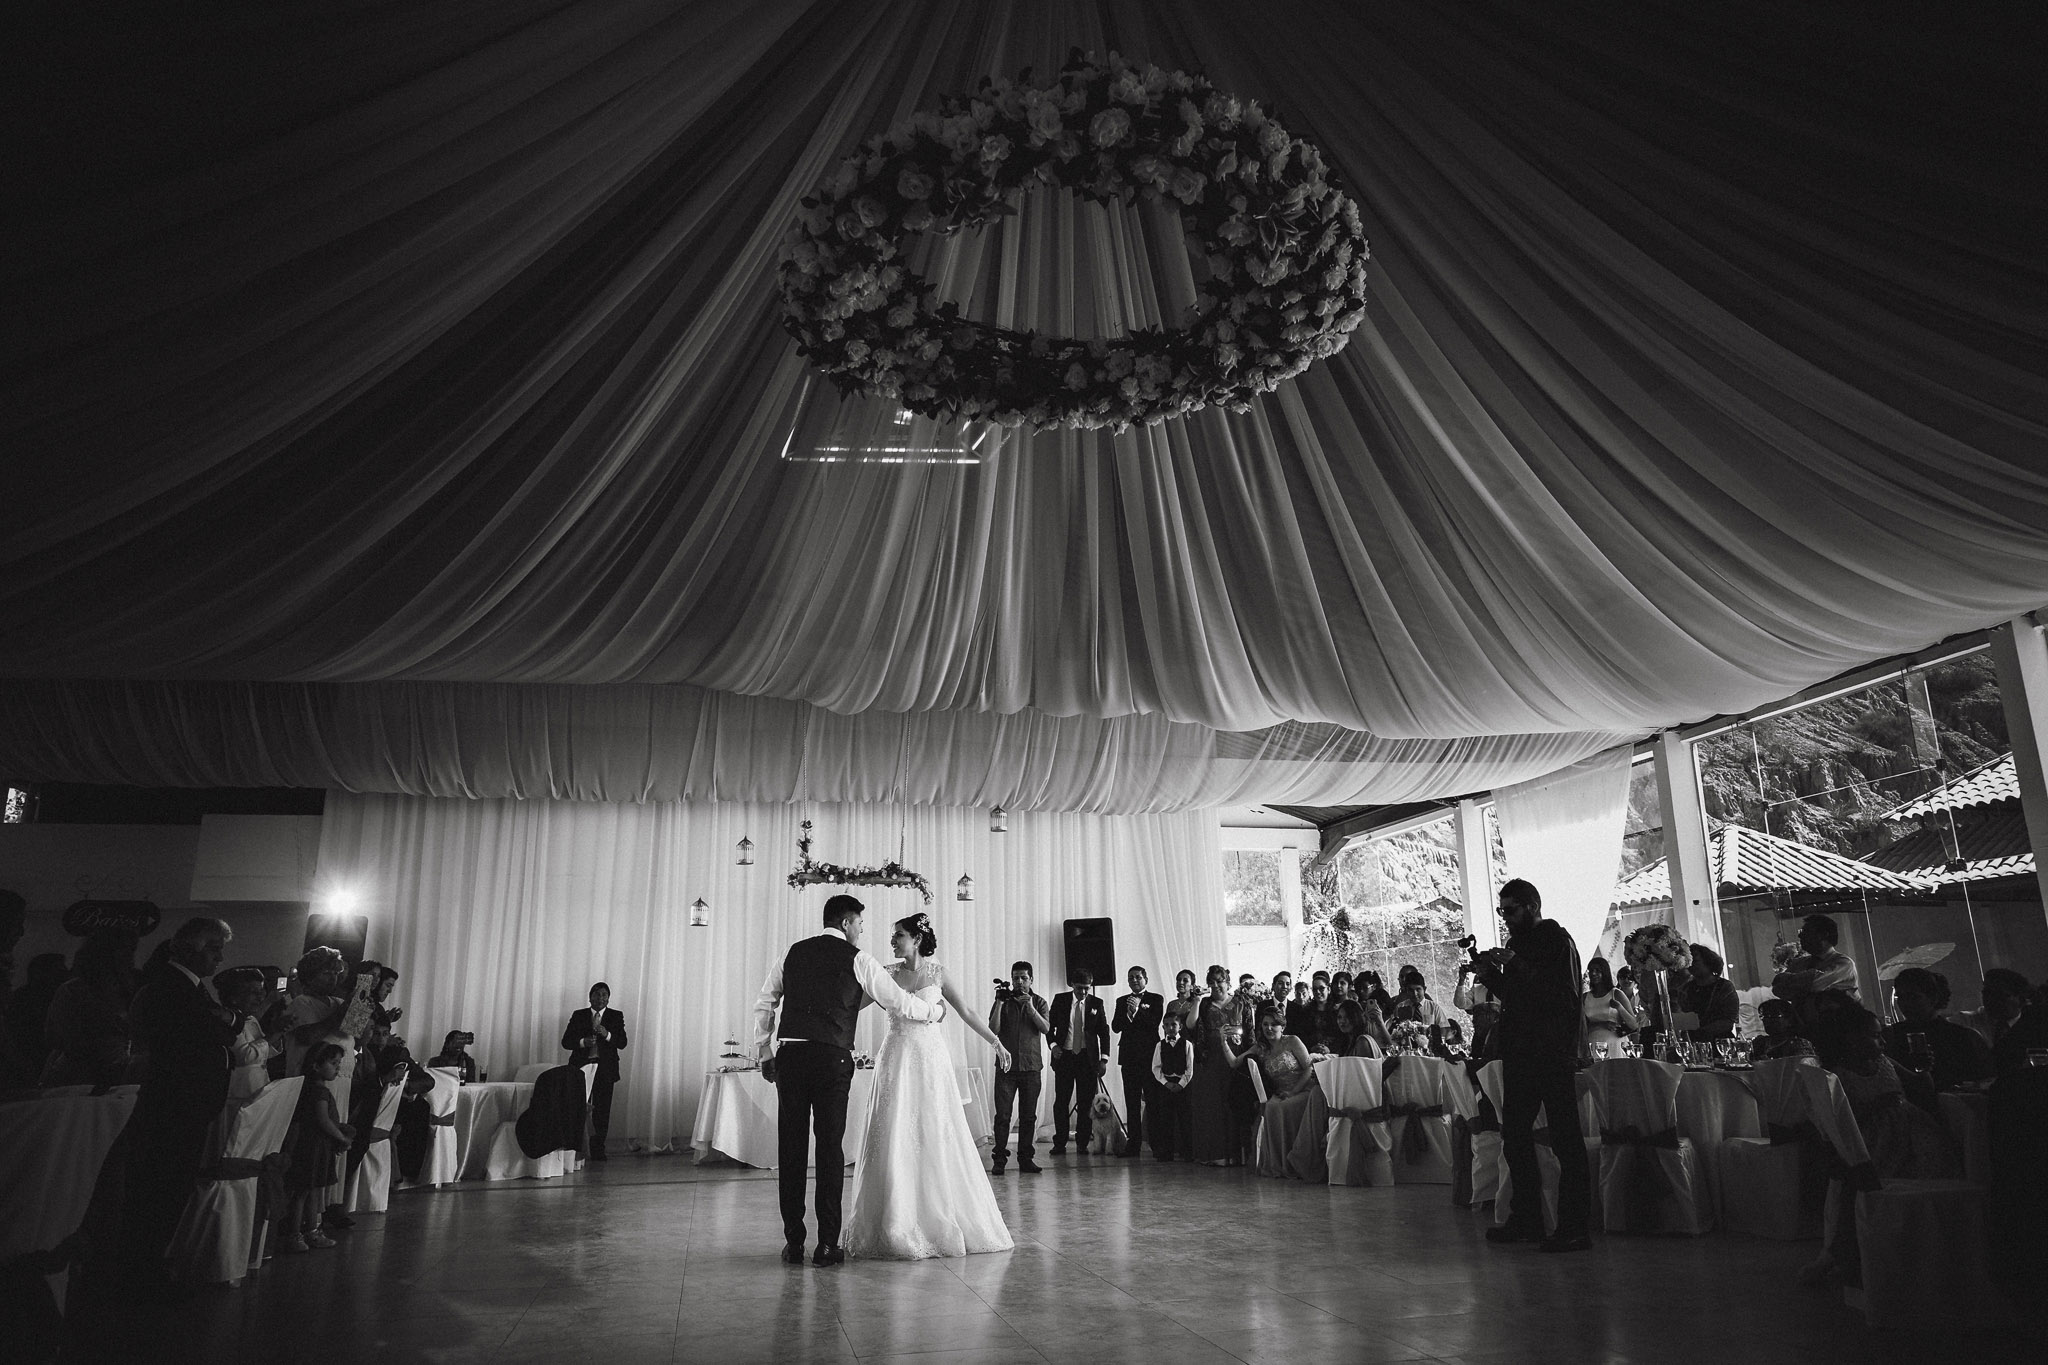 wedding-bolivia-la-paz-first-dance-black-white